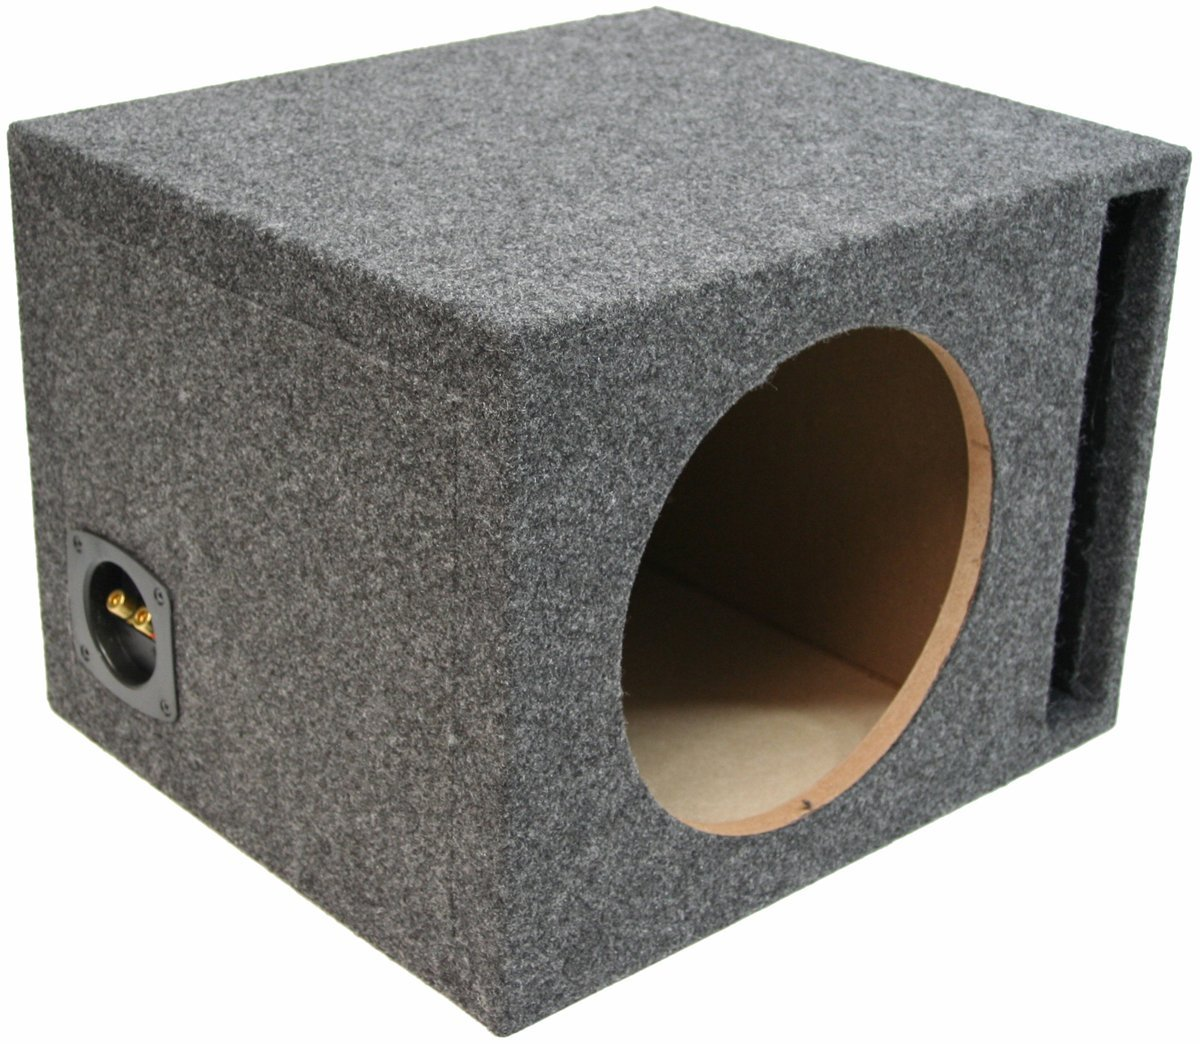 "ASC Single 12"" Subwoofer Universal Fit Vented Port Sub Box Speaker Enclosure"